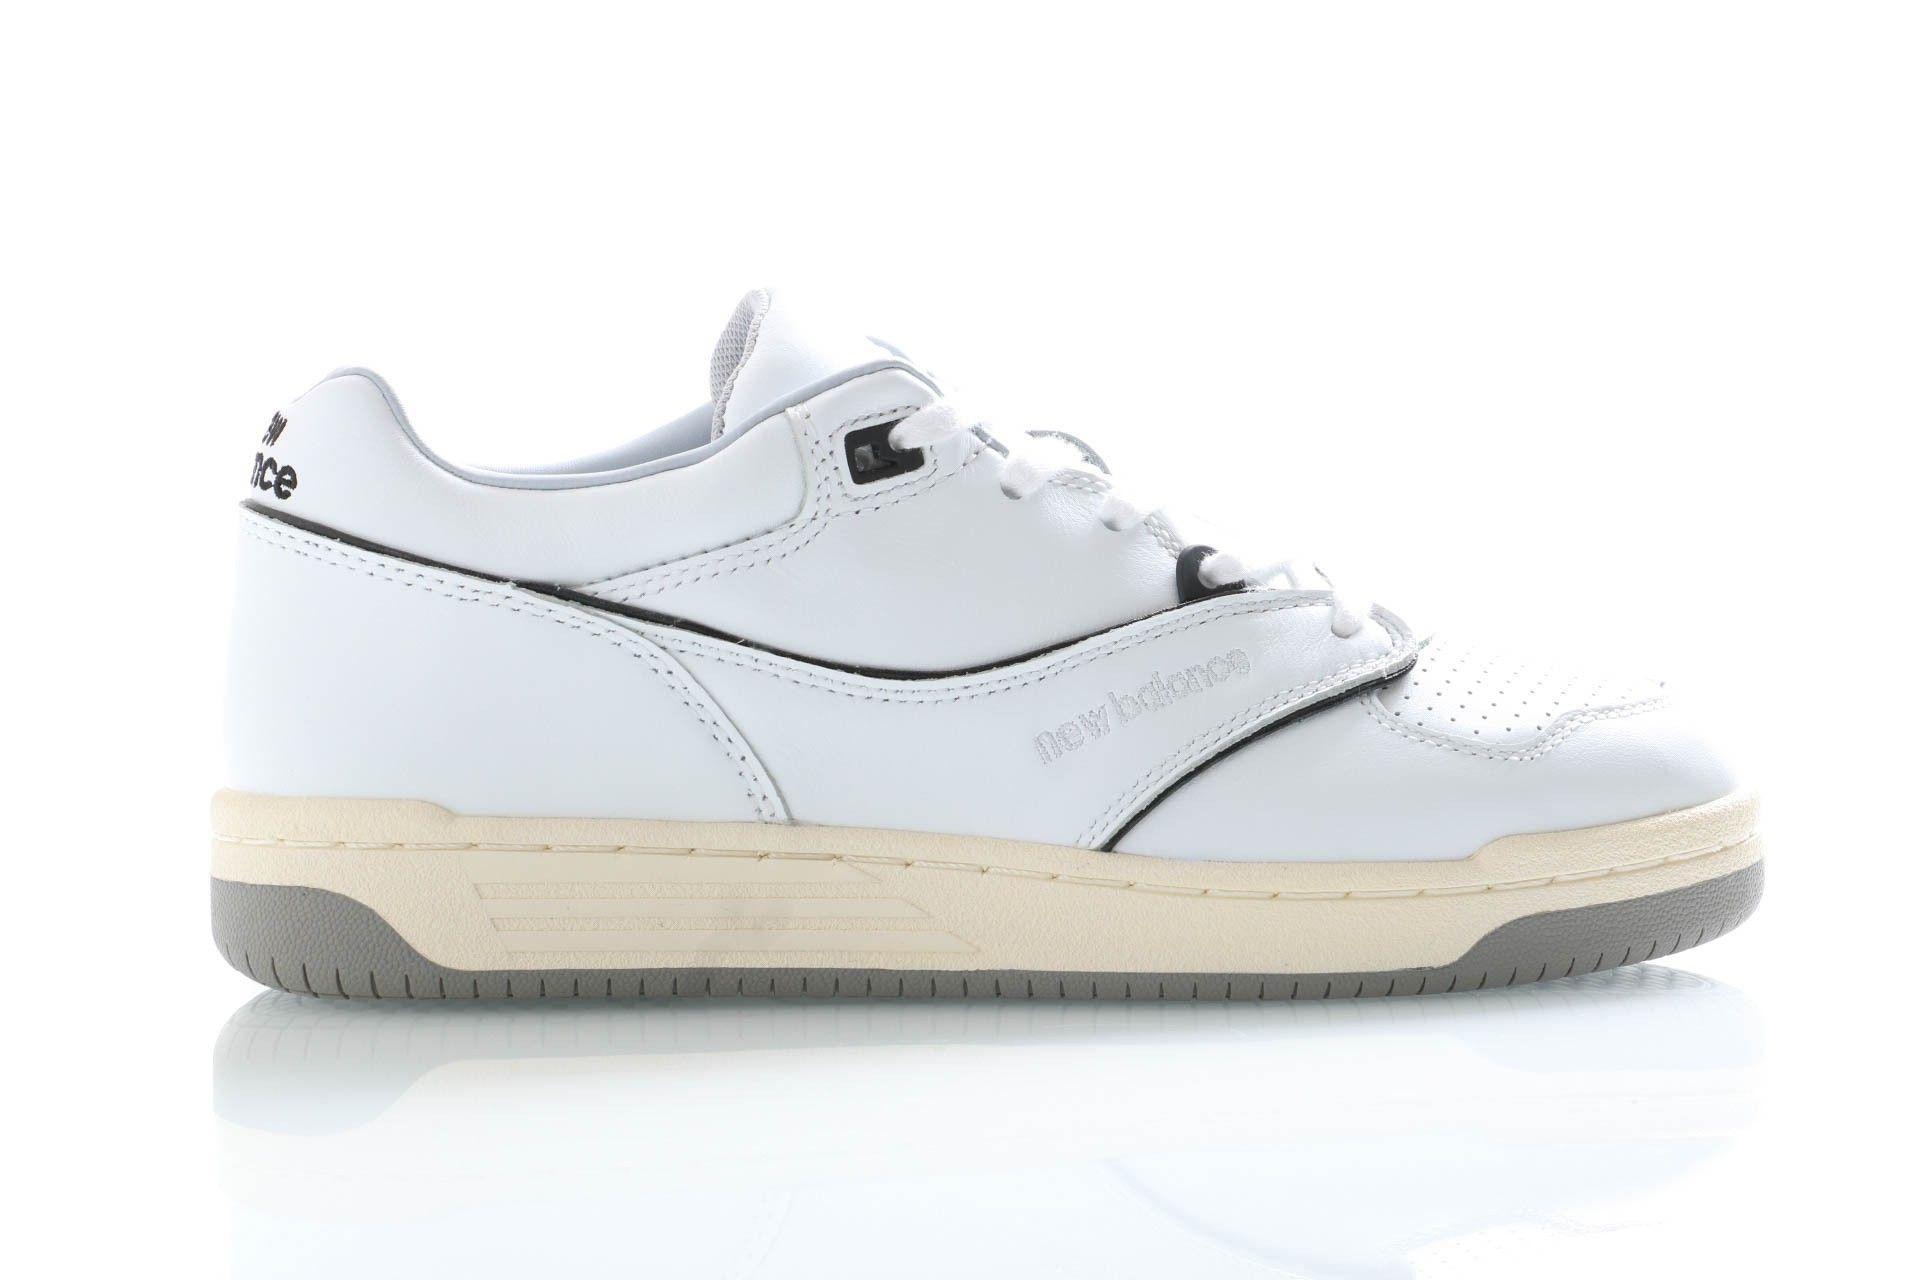 Afbeelding van New Balance Sneakers CT1500SA 1064337 779091-60